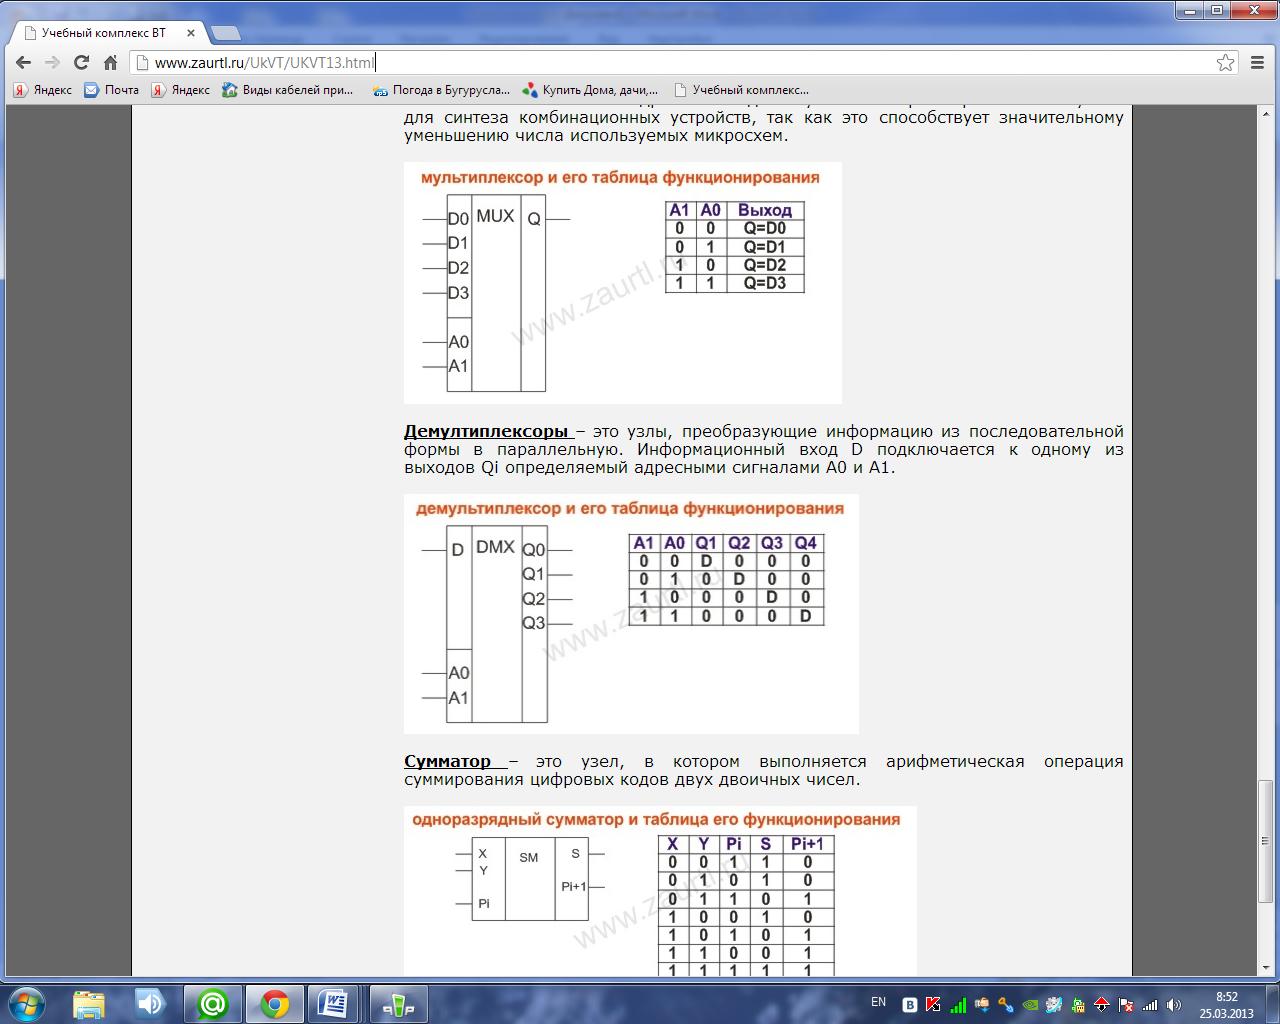 схема восьмиразрядного сумматора